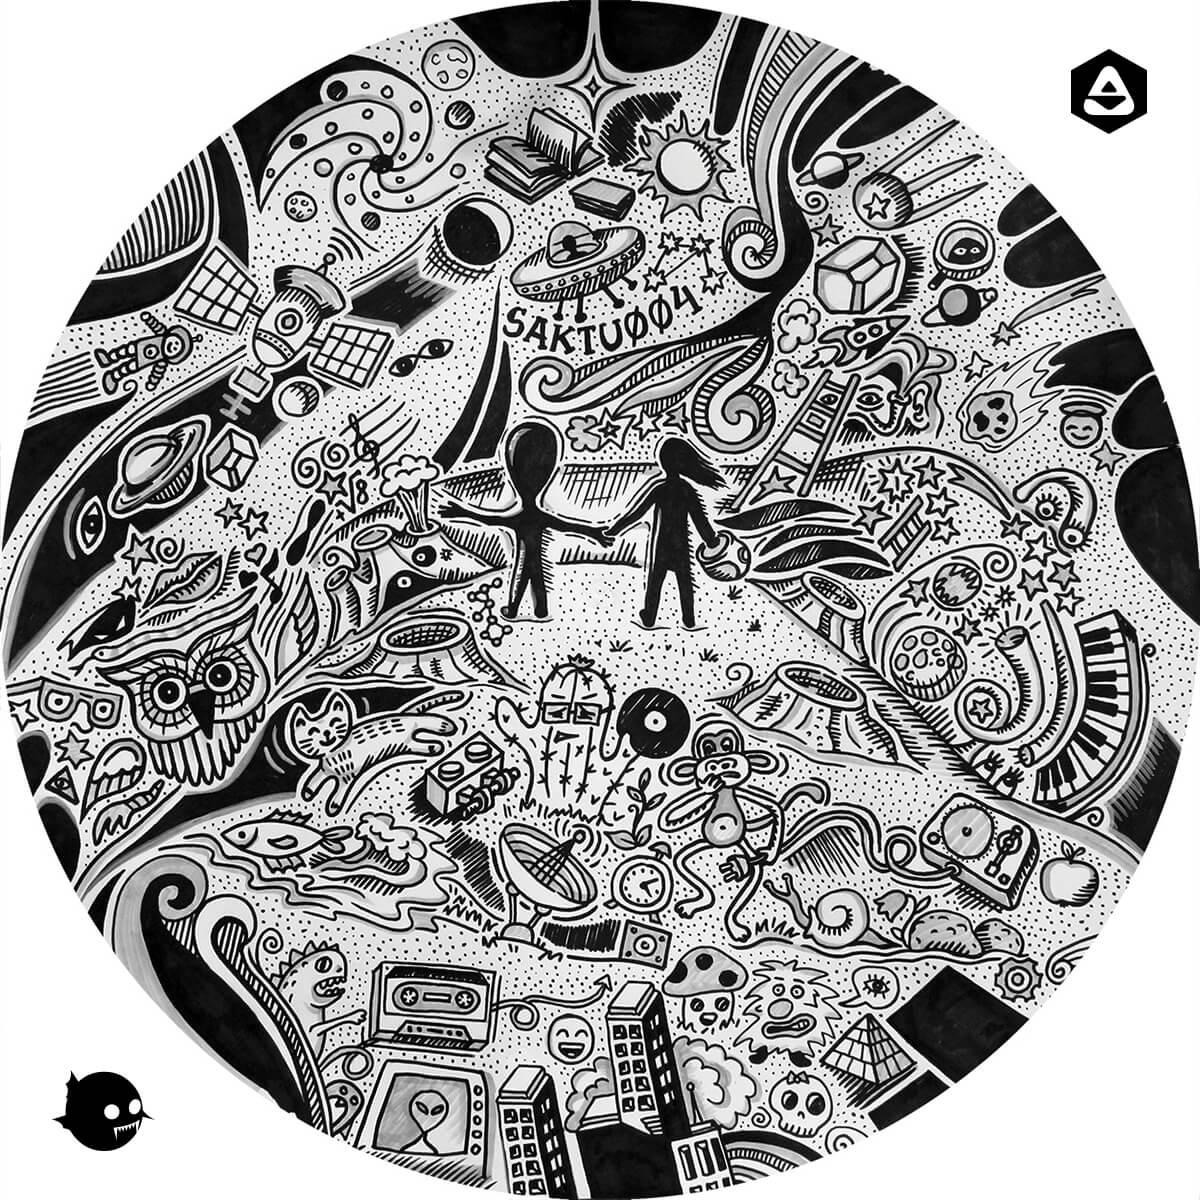 Matpri, Saktu - Vidimo [Saktu] 01